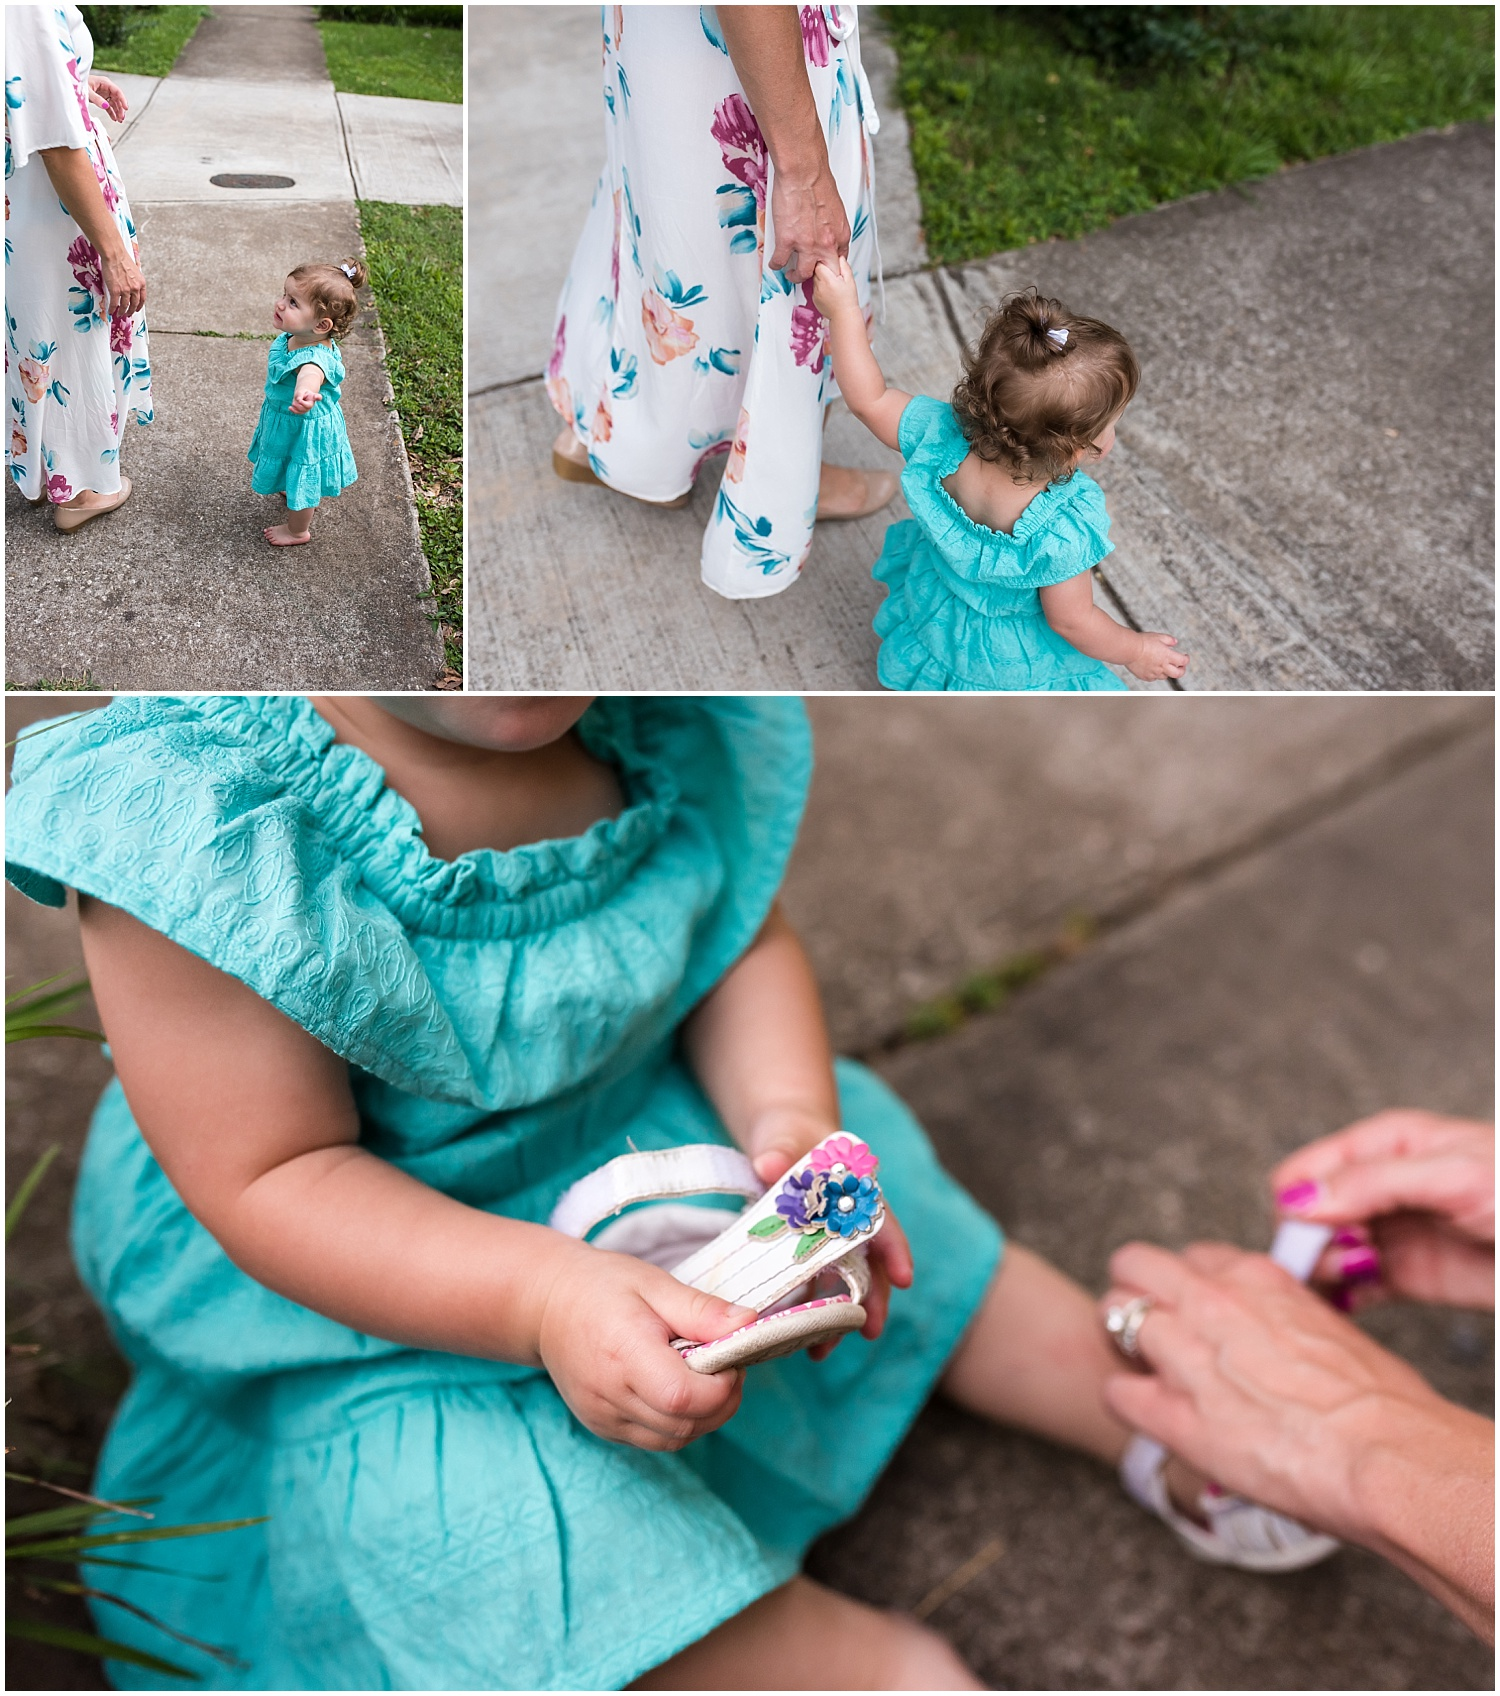 kirkwood-atlanta-family-session-tabitha-maegan-photography (7).jpg